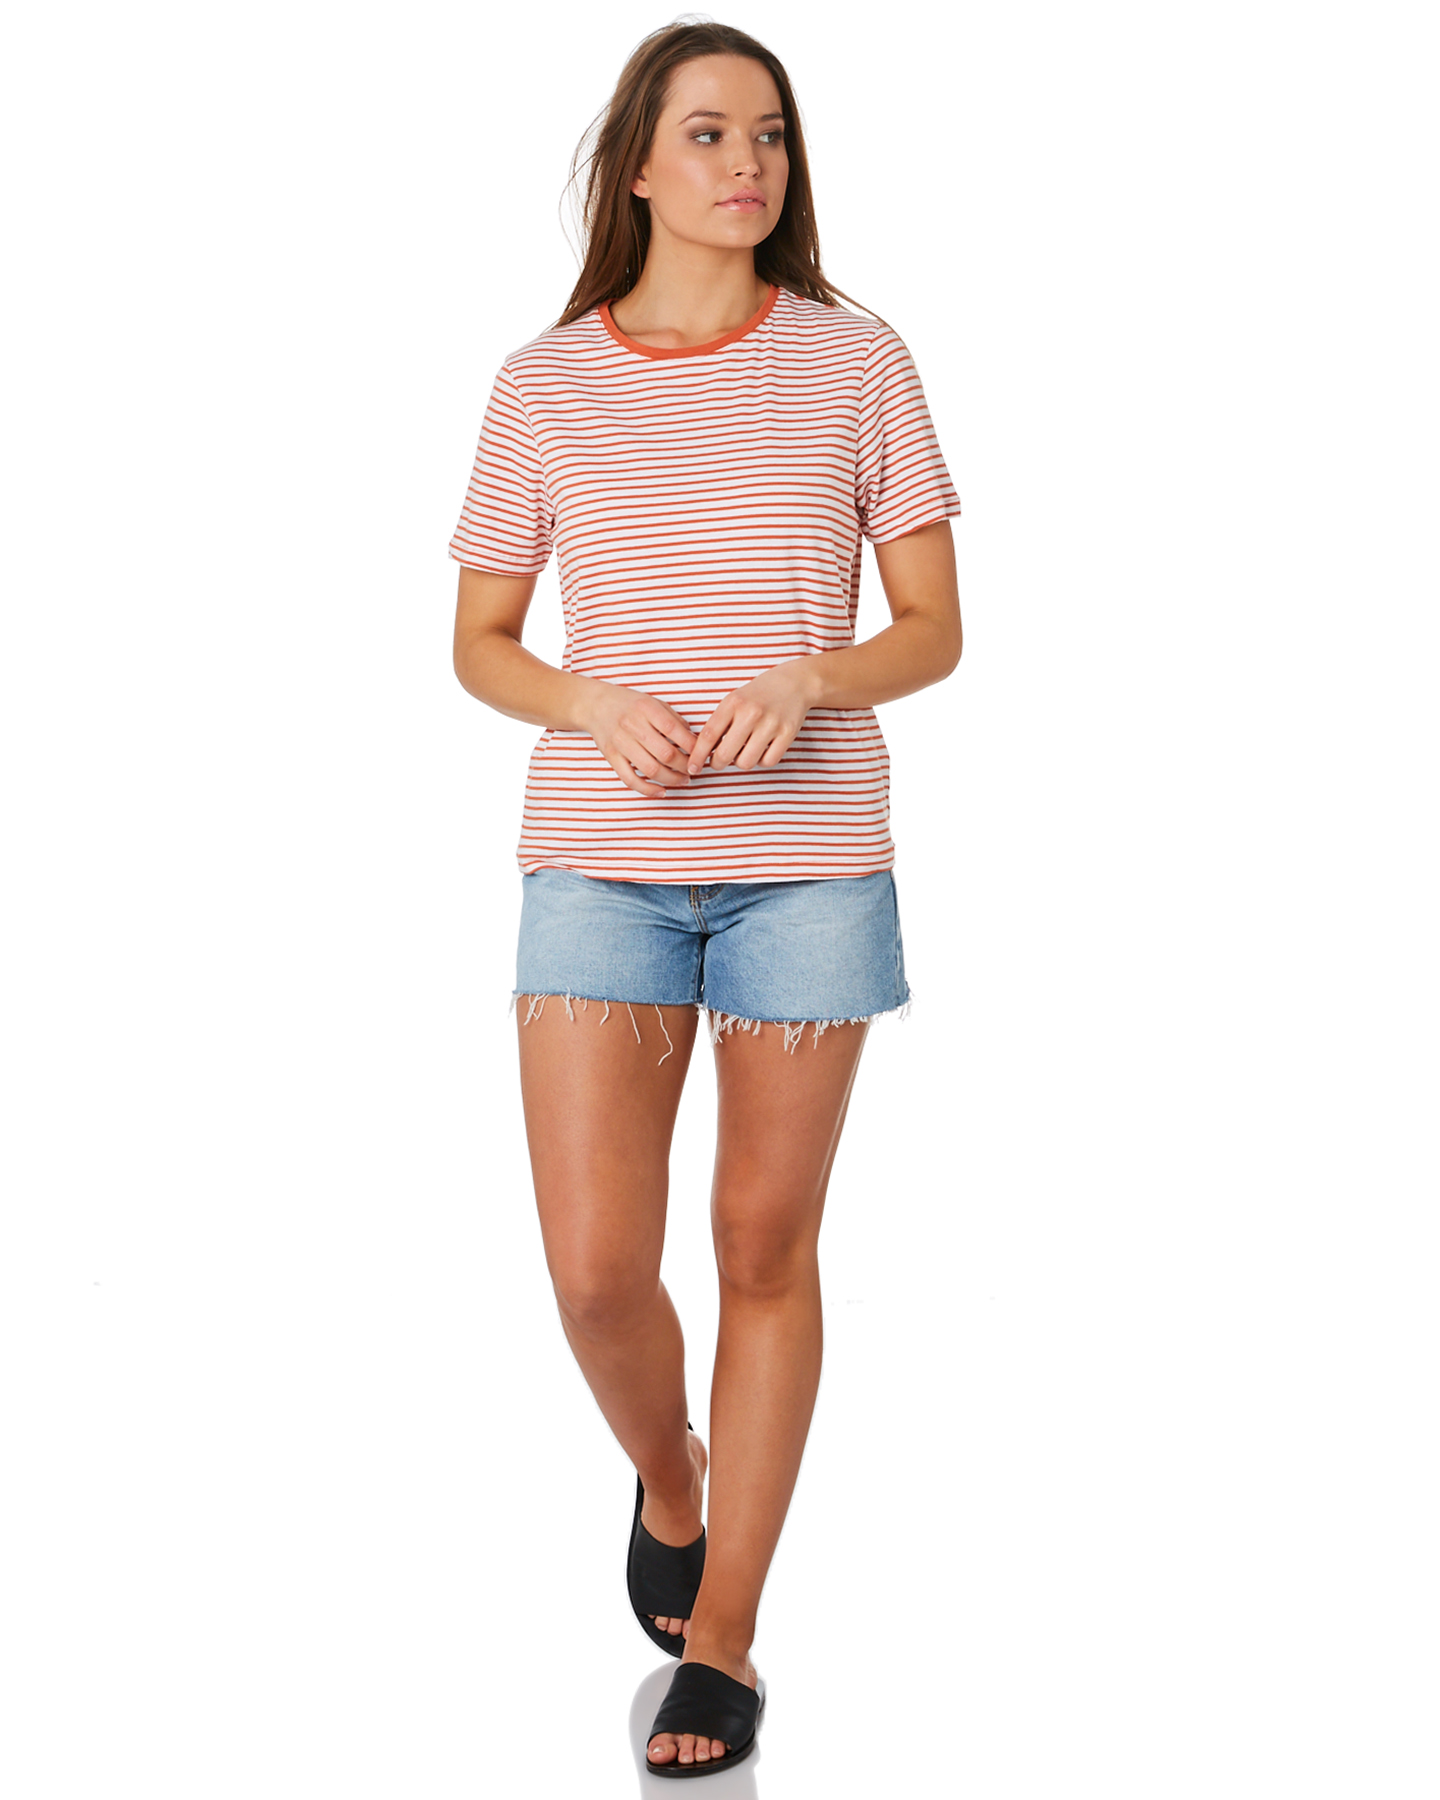 New-Swell-Women-039-s-Jesse-Stripe-Tee-Crew-Neck-Short-Sleeve-Cotton thumbnail 15